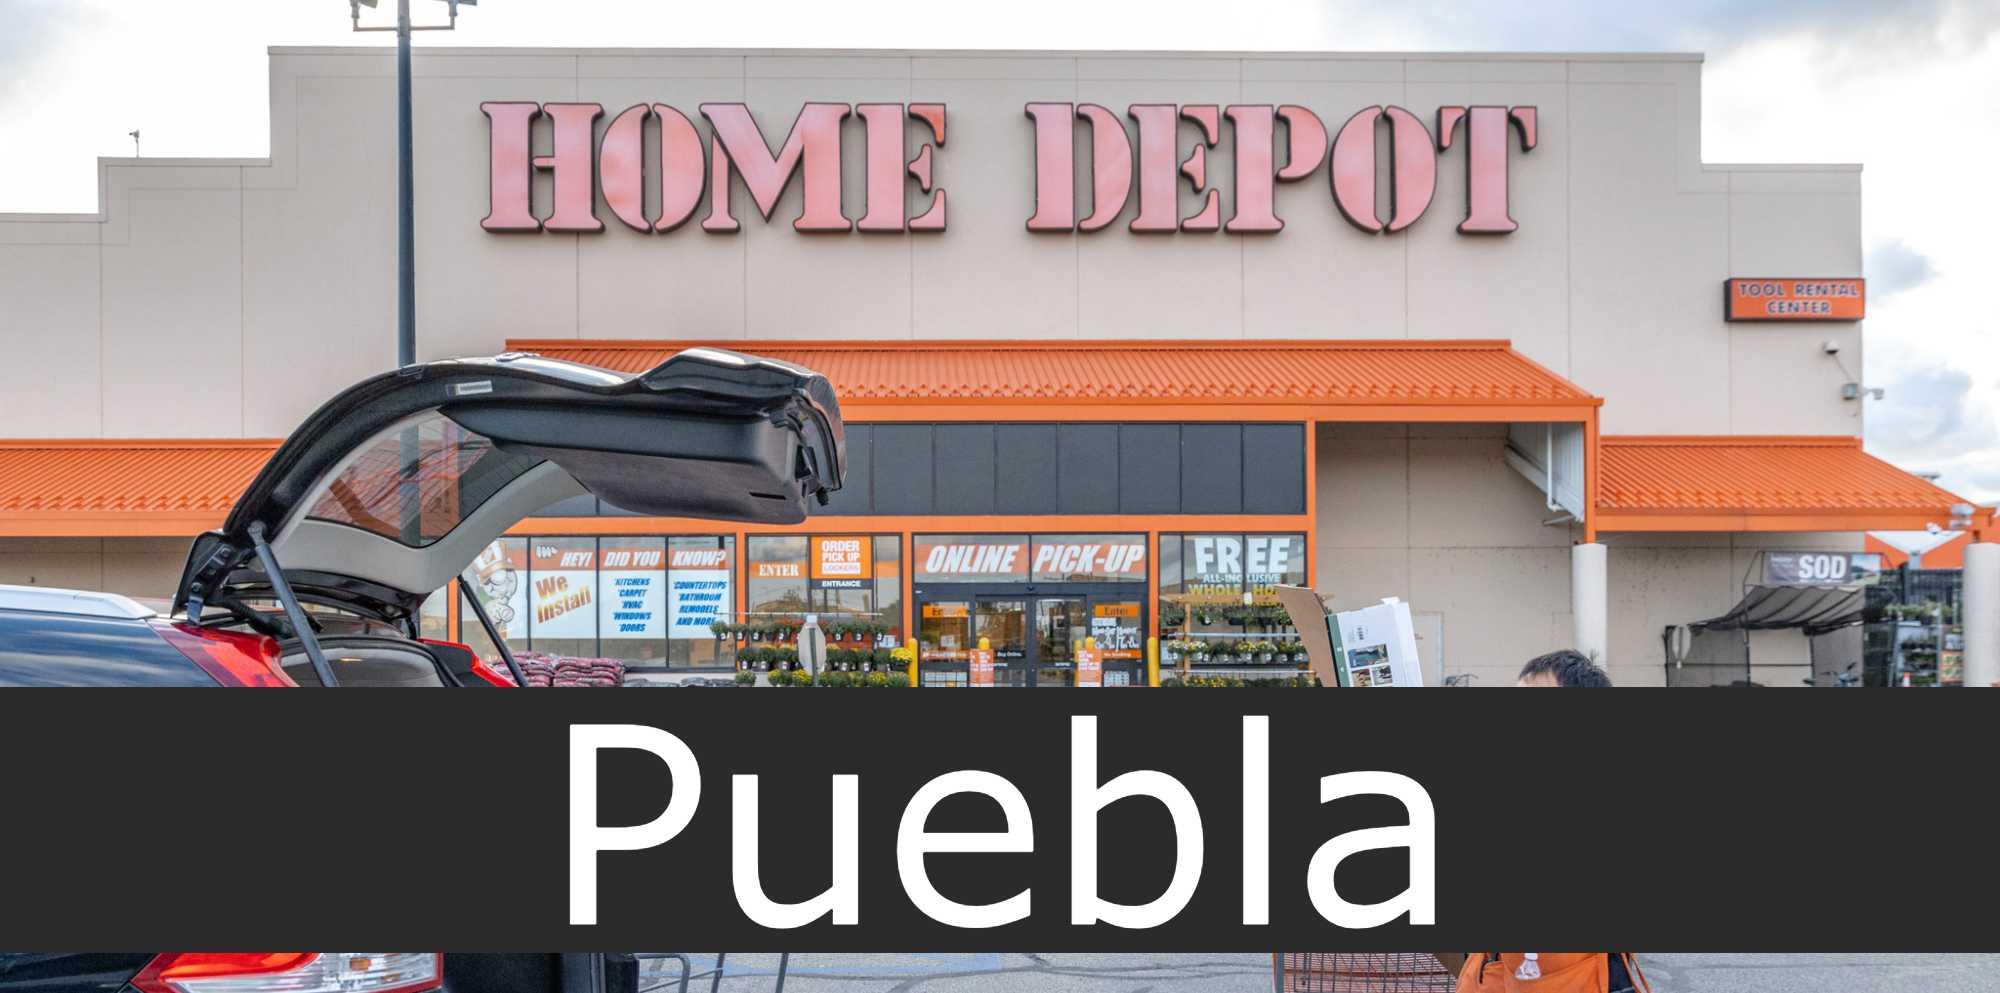 home depot Puebla